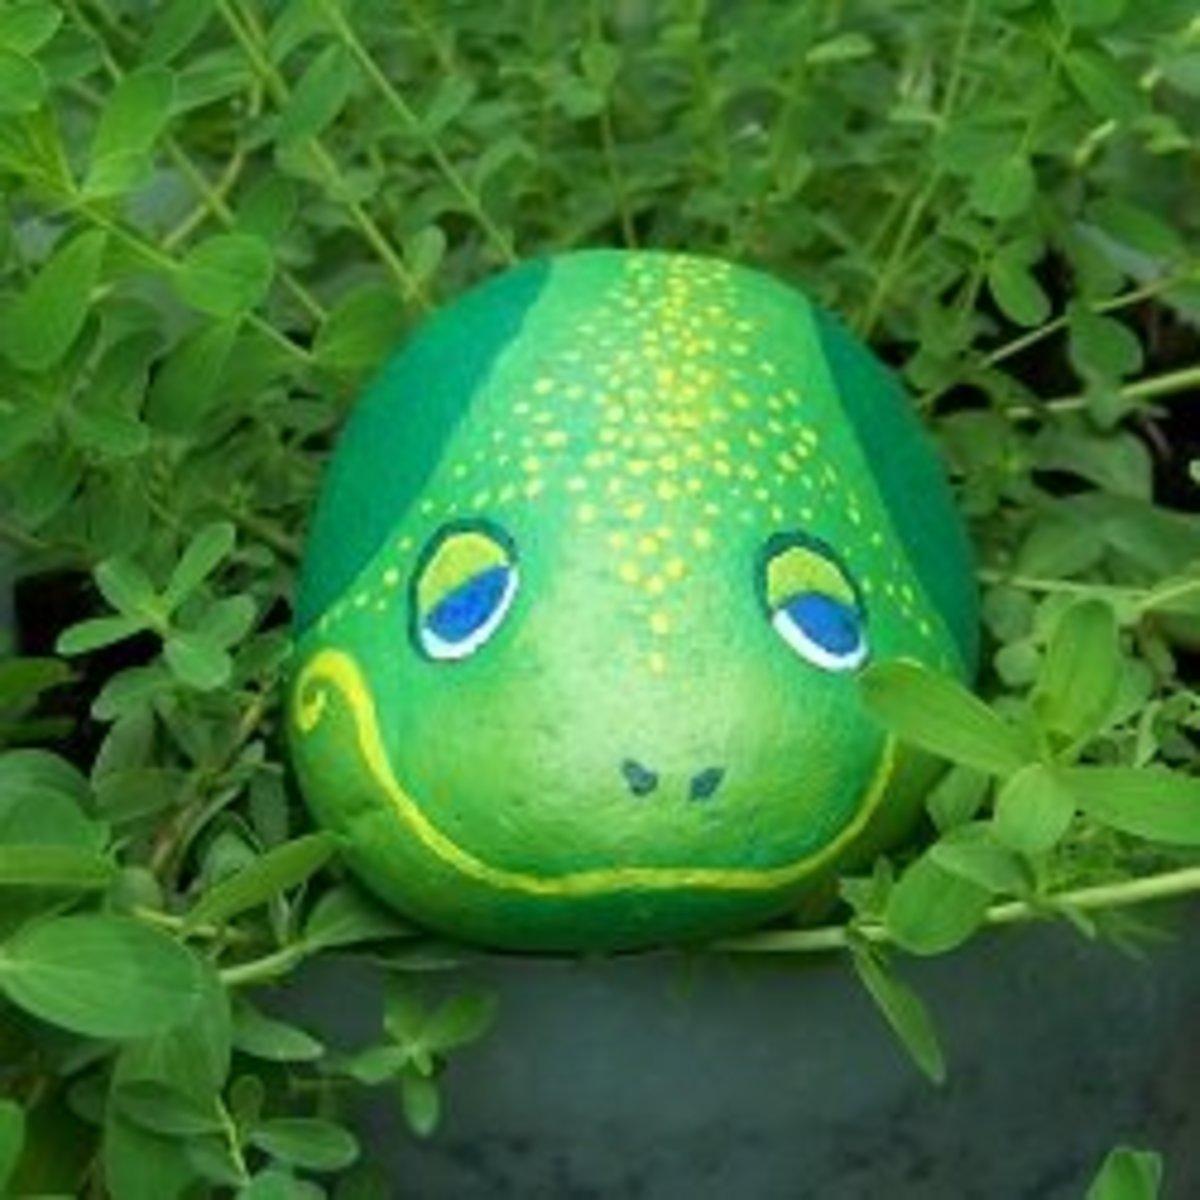 Painted Frog: Rock Art